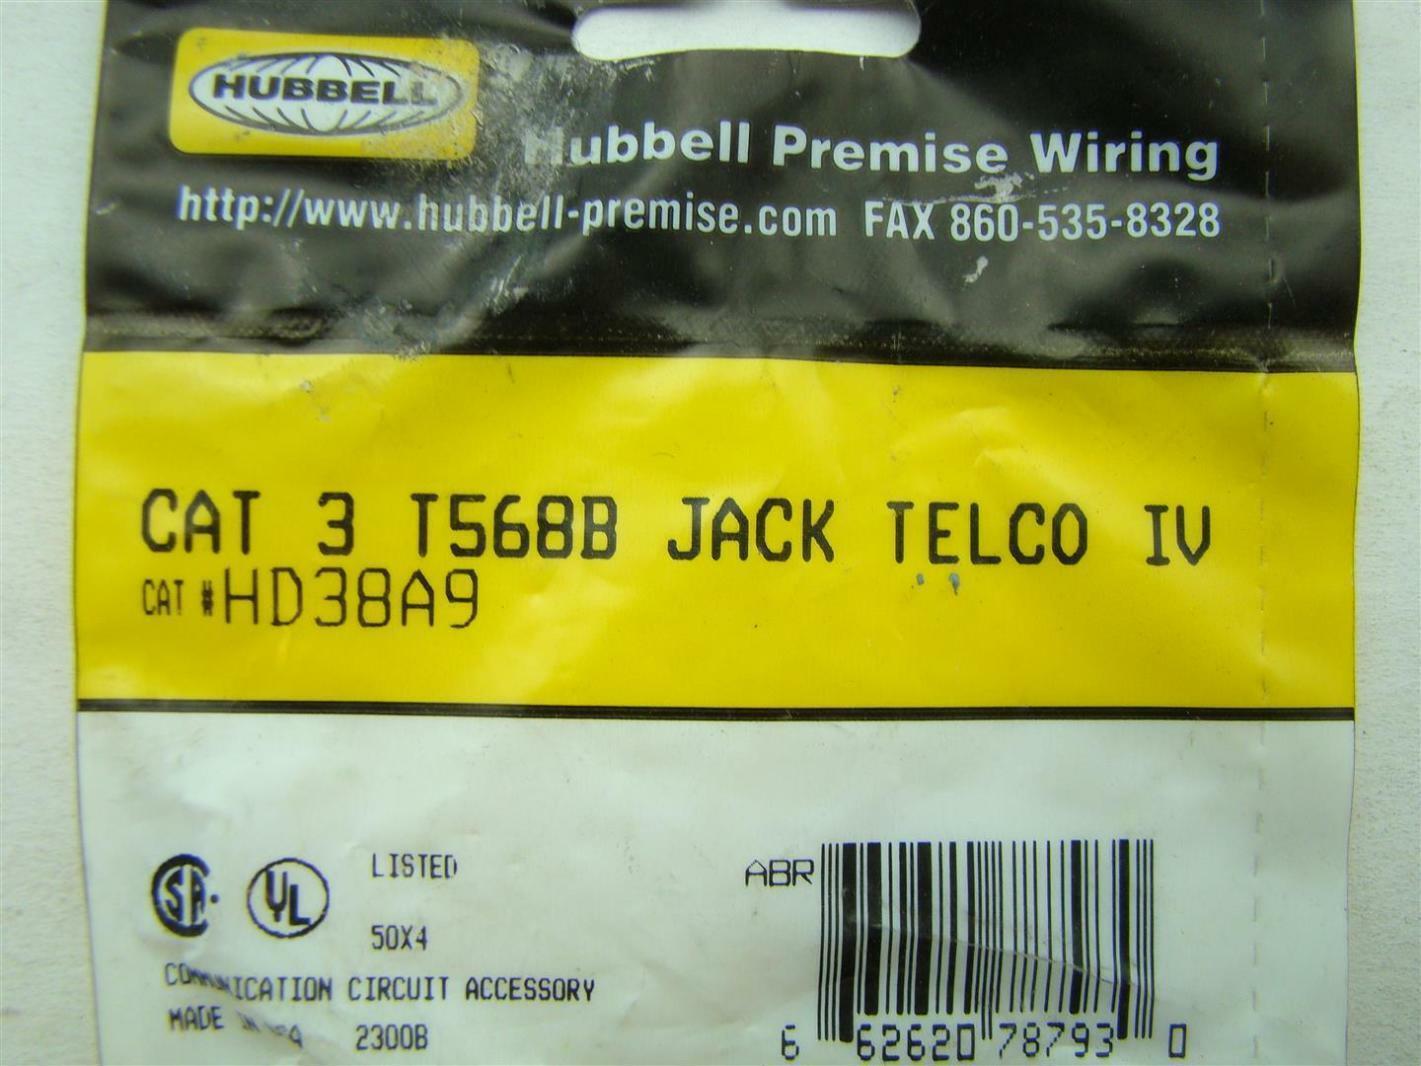 11 pcs hubbell premise wiring hd38a9 joseph fazzio incorporated rh fazziosurplus com hubbell premise wiring ftu1sp hubbell premise wiring catalogue